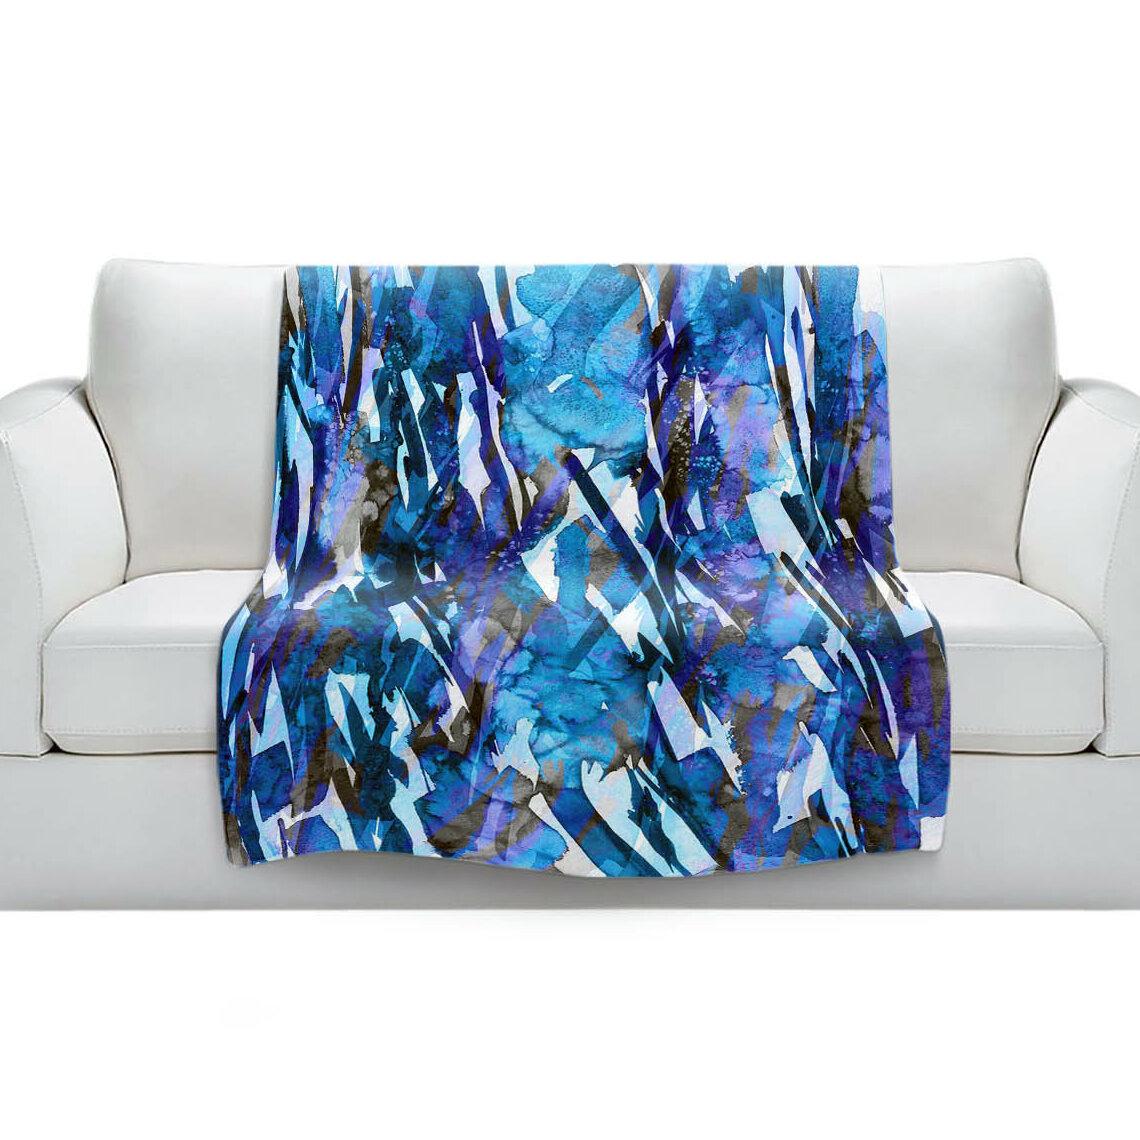 East Urban Home Frosty Bouquet Blue Blanket Wayfair